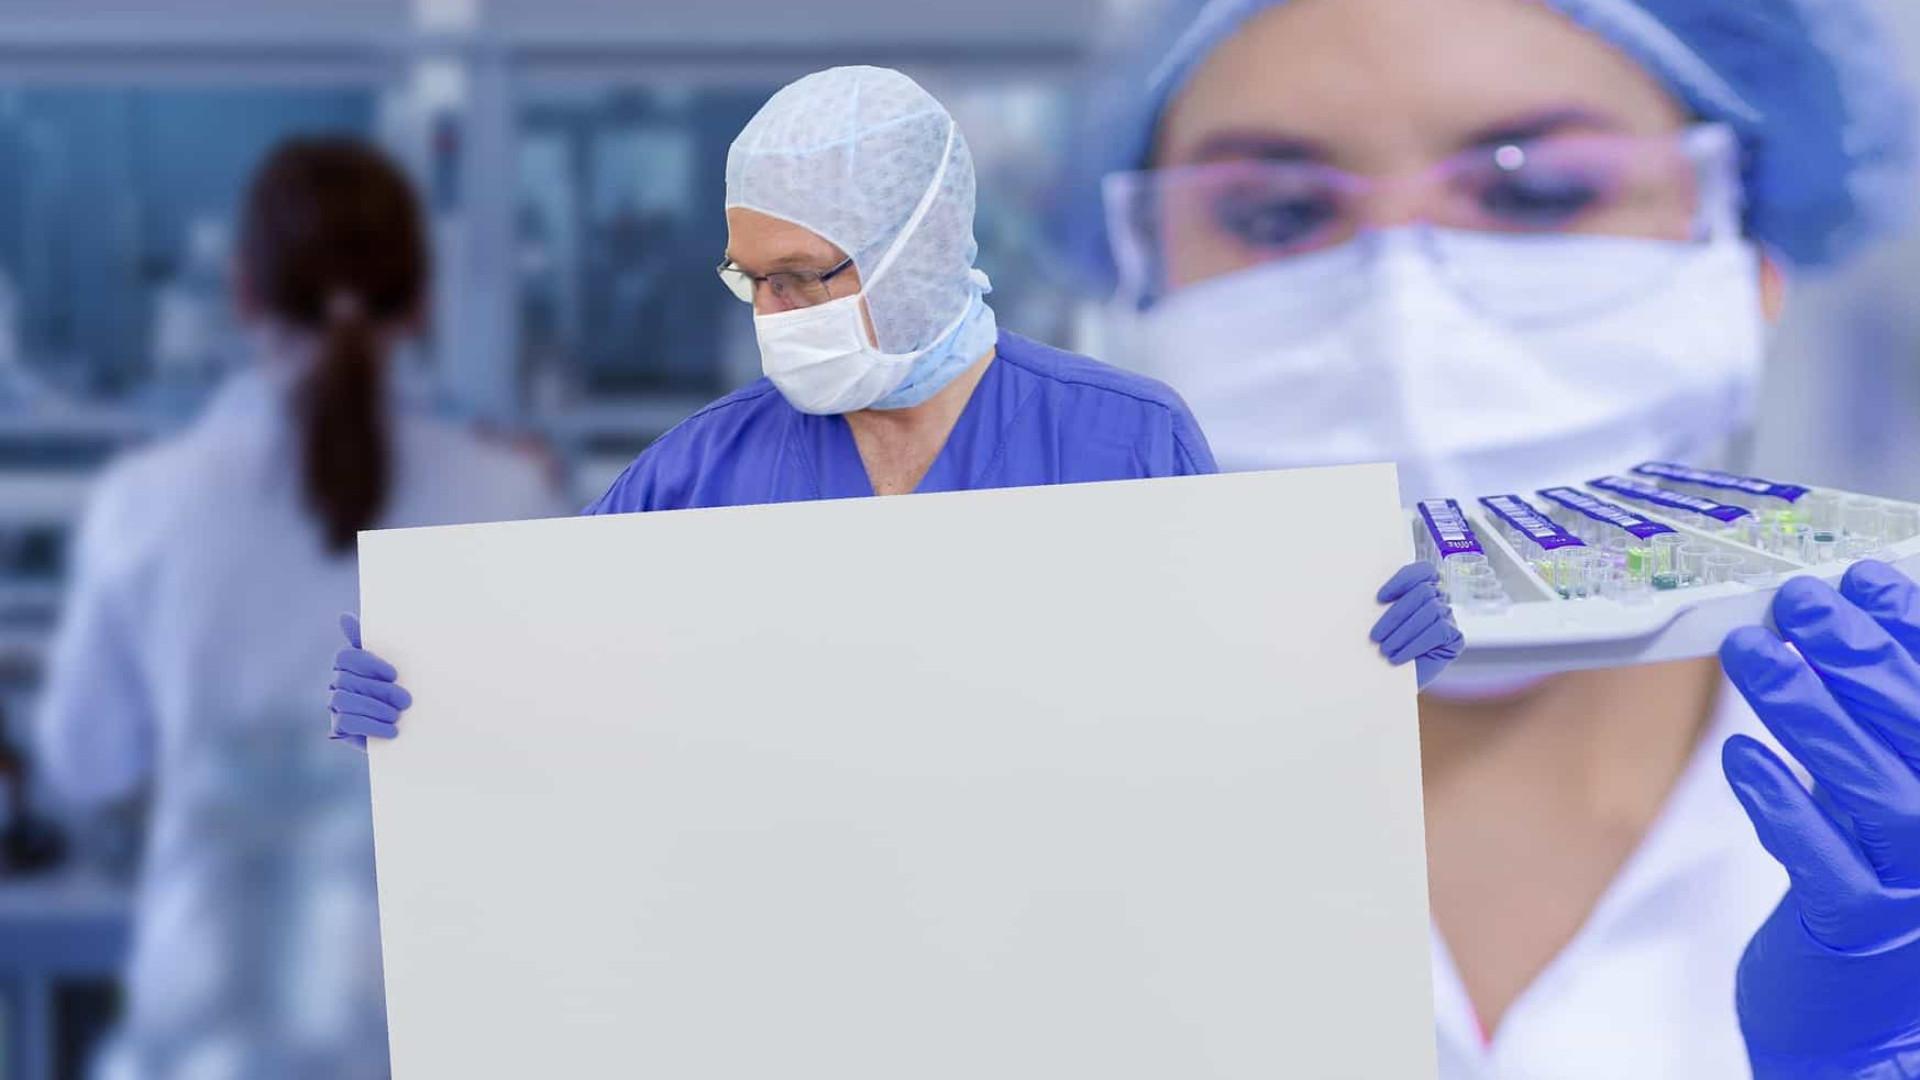 Coronavírus é transmitido rápido na fase inicial da doença